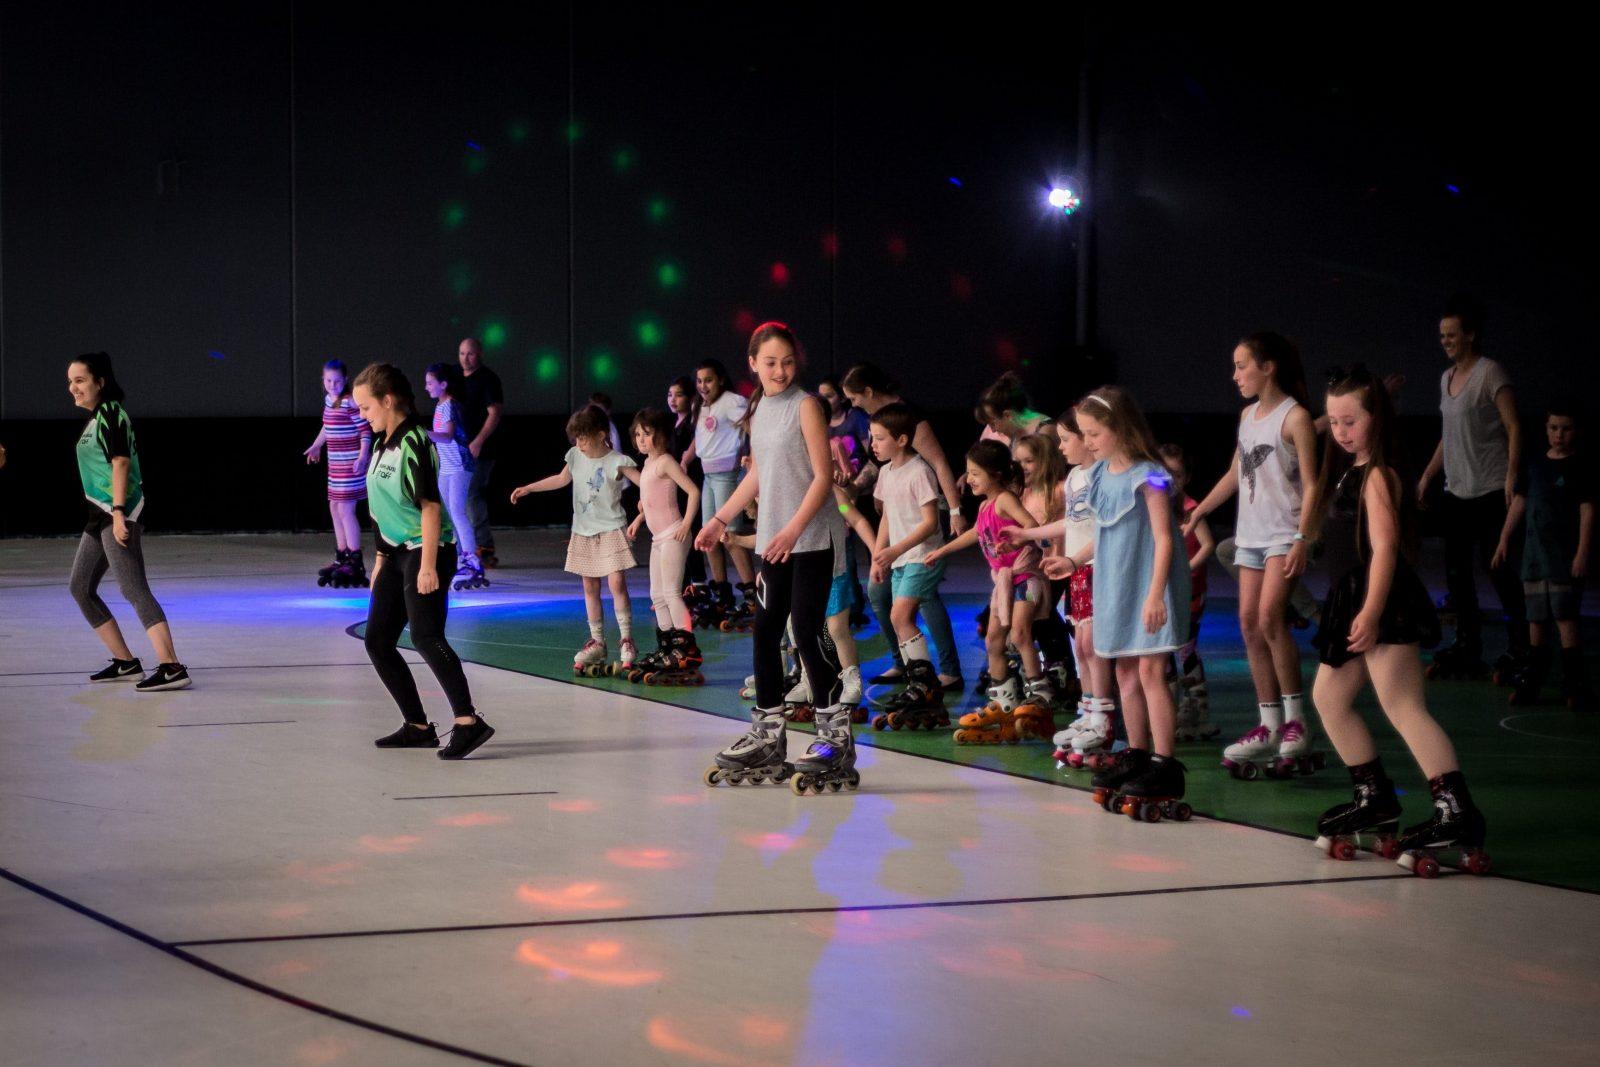 Kids having fun roller skating at Sk8house